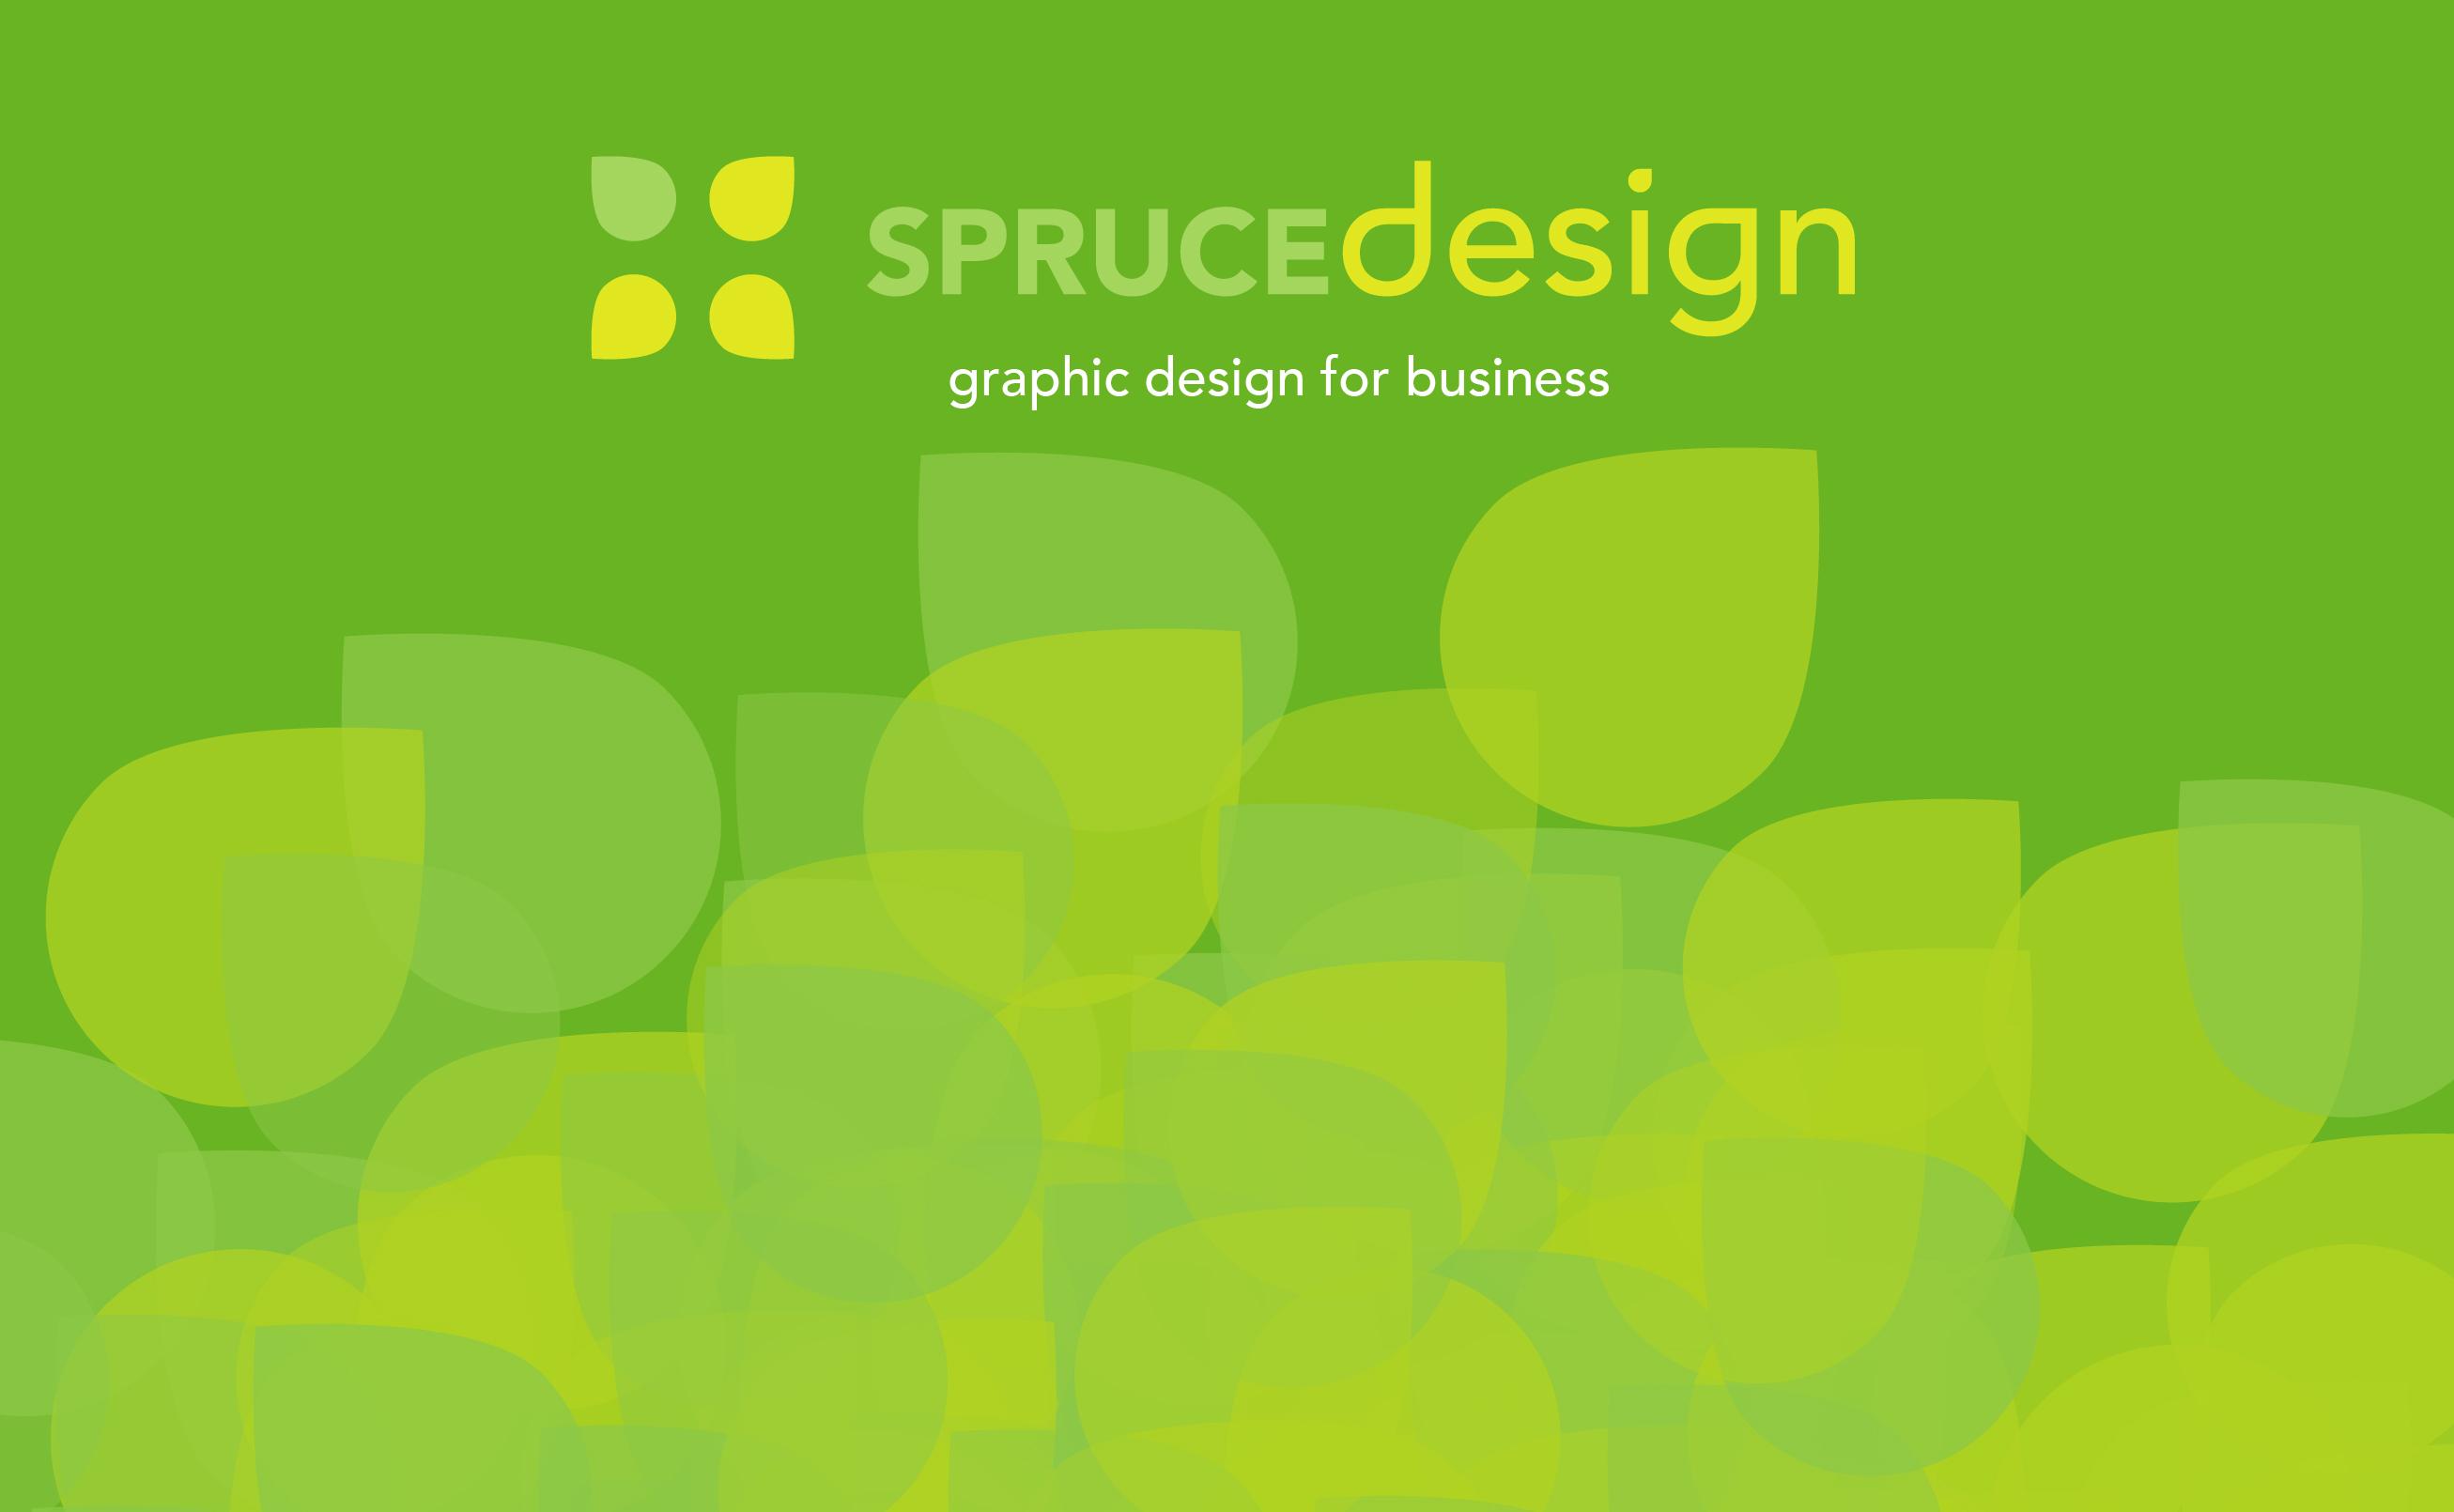 Spruce Design